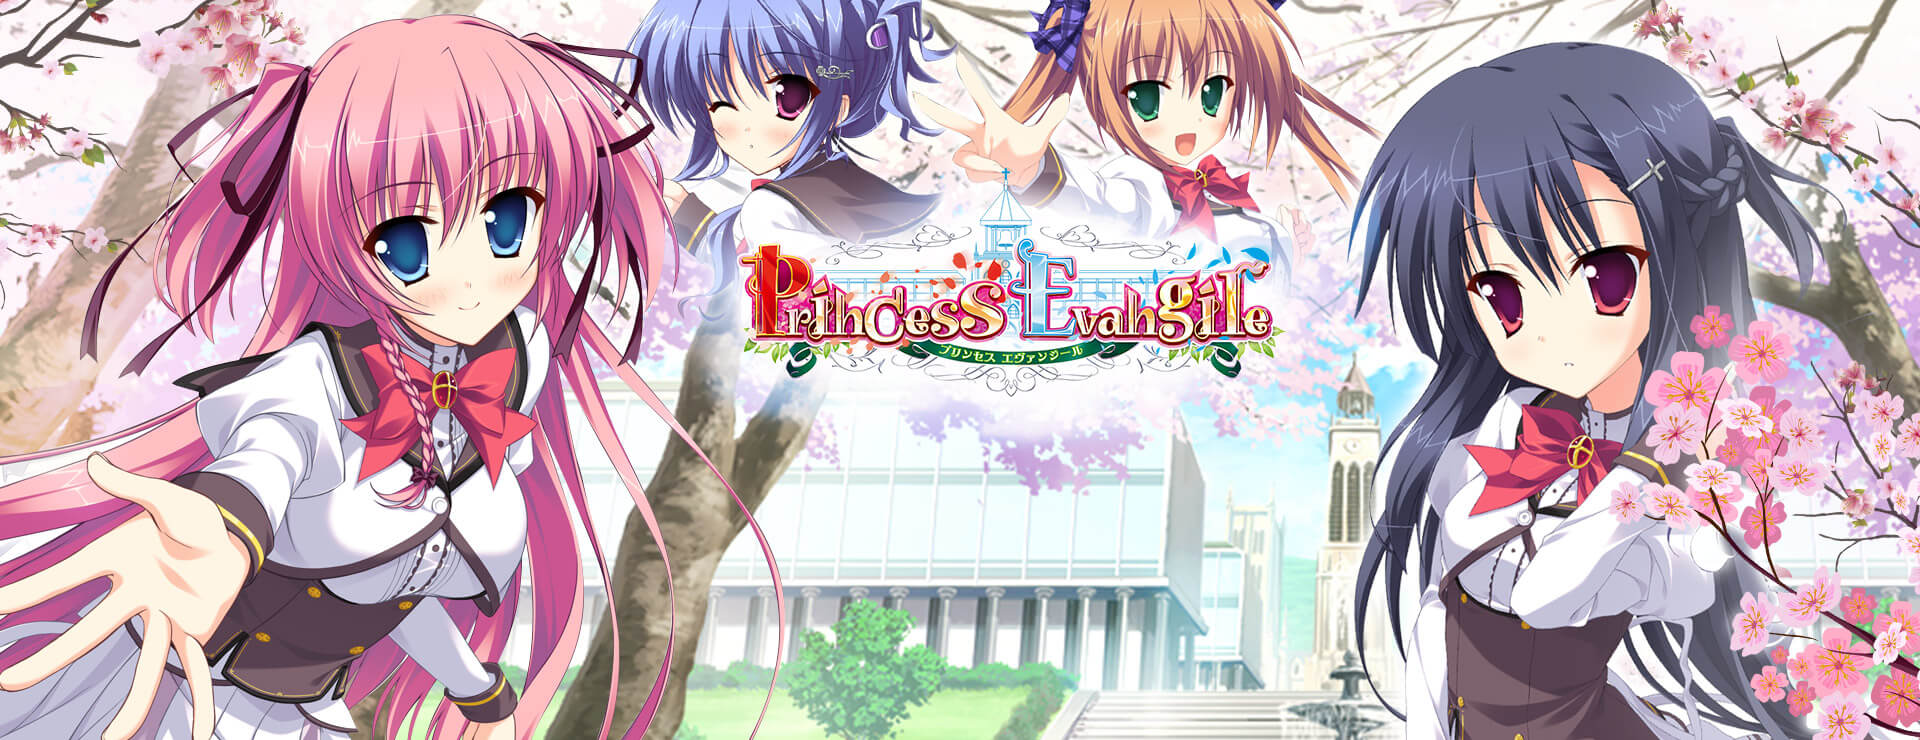 Princess Evangile - Visual Novel Game